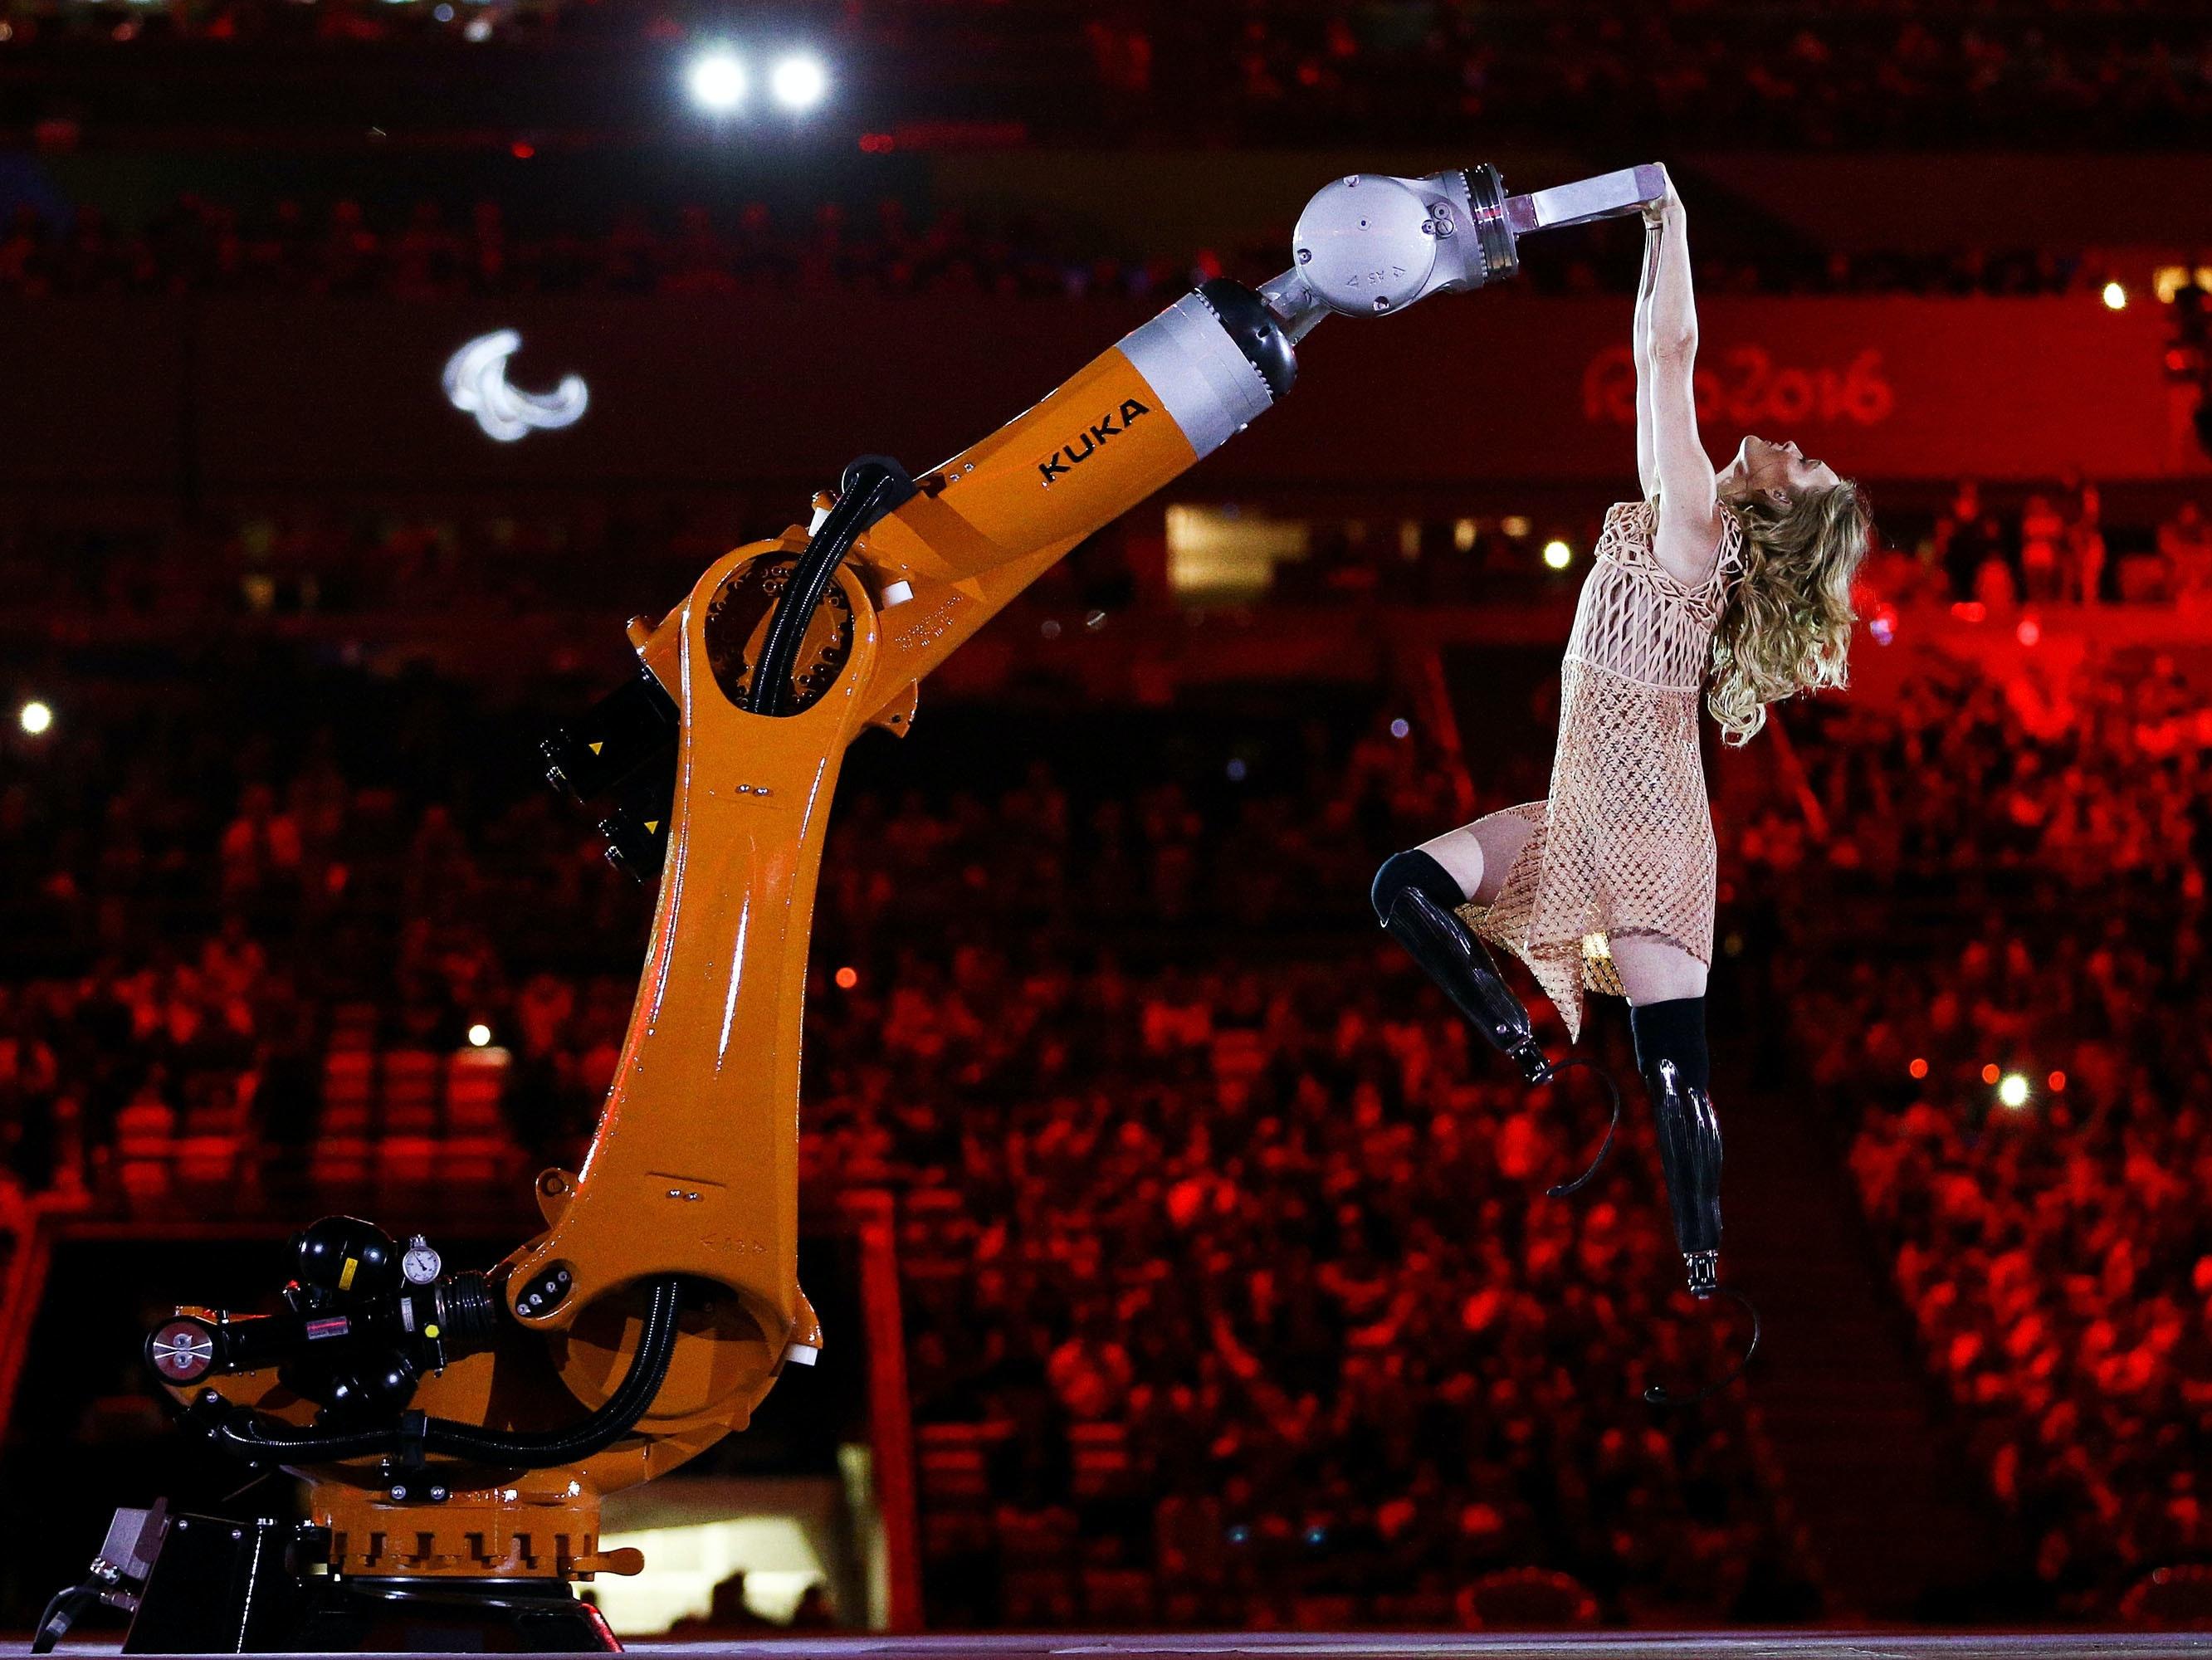 U.K. Politicians: Govt Is Not Prepared for Robot A.I. Future